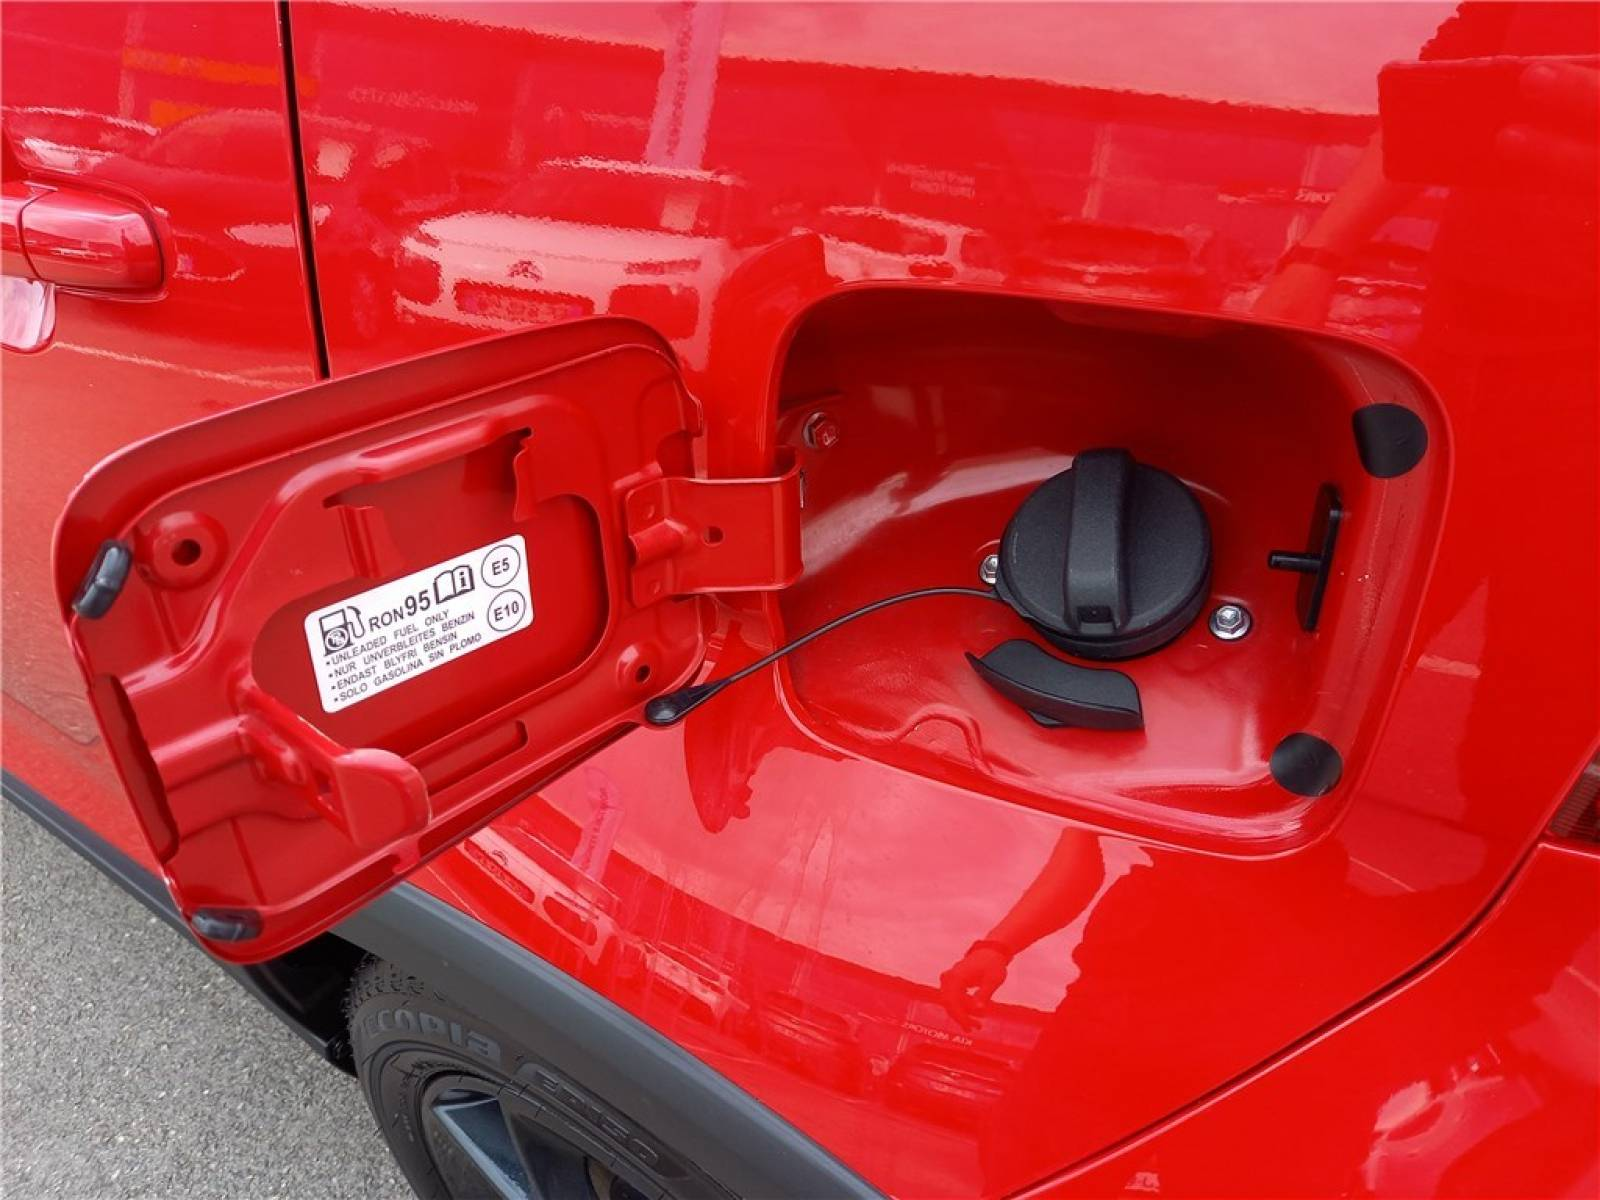 SUZUKI Ignis 1.2 Dualjet Auto (AGS) - véhicule d'occasion - Groupe Guillet - Opel Magicauto - Chalon-sur-Saône - 71380 - Saint-Marcel - 6